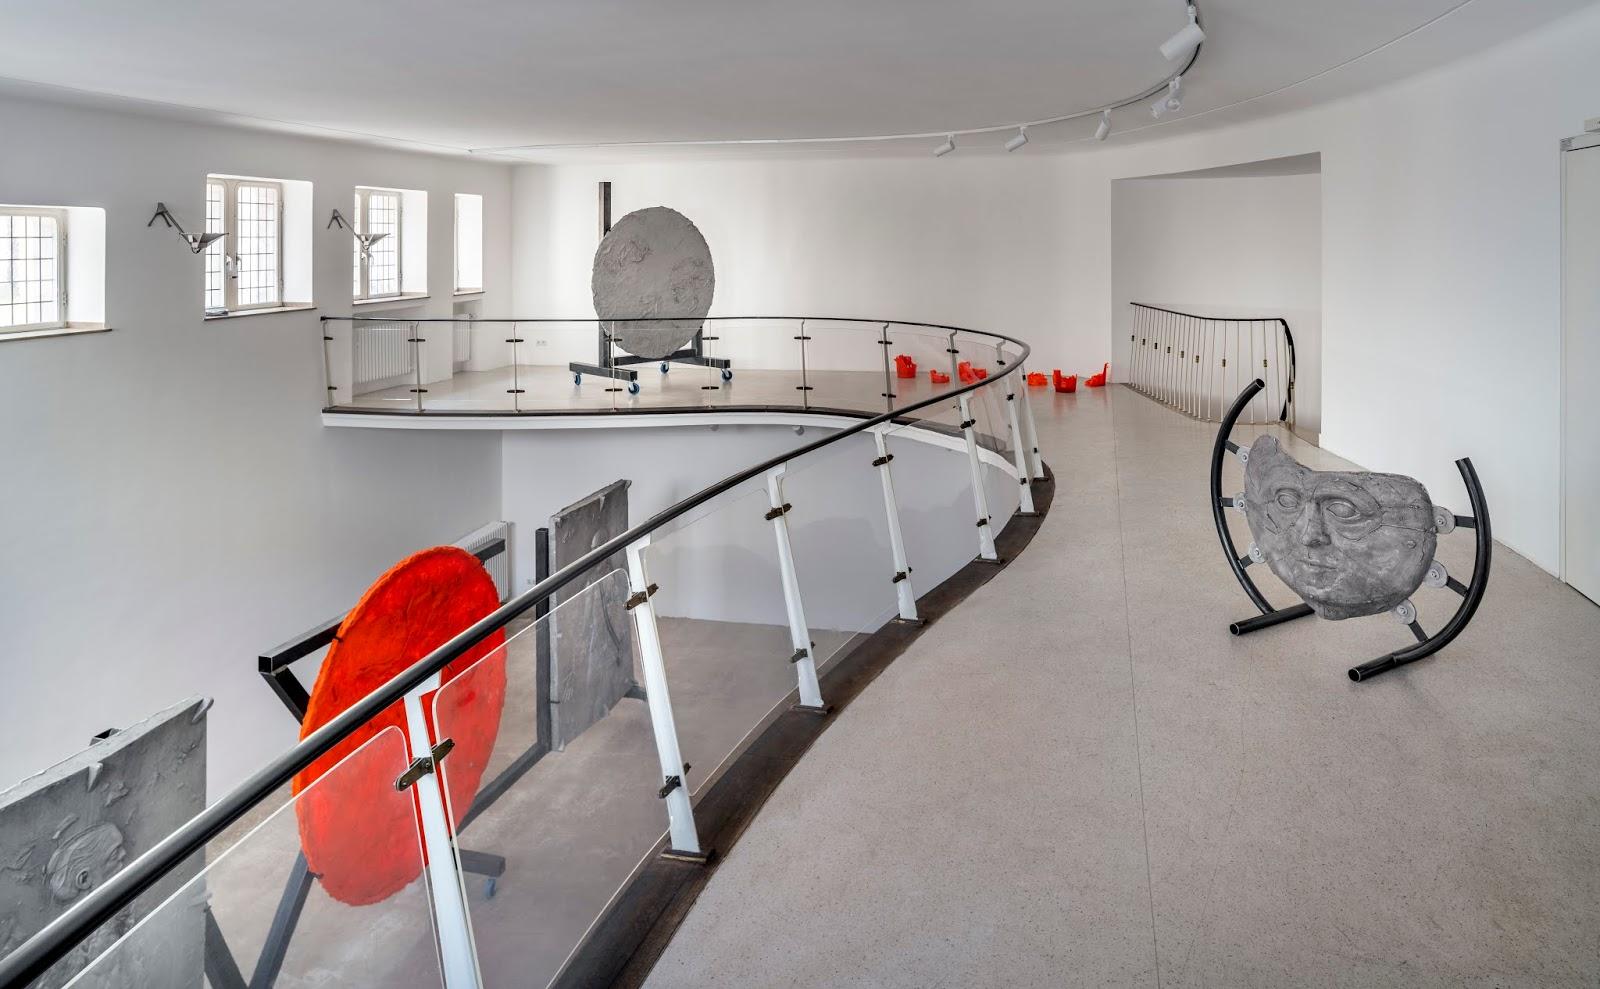 Https Www Museumsbund At Uploads Neues Museum Archiv Nm 19 3 Pdf